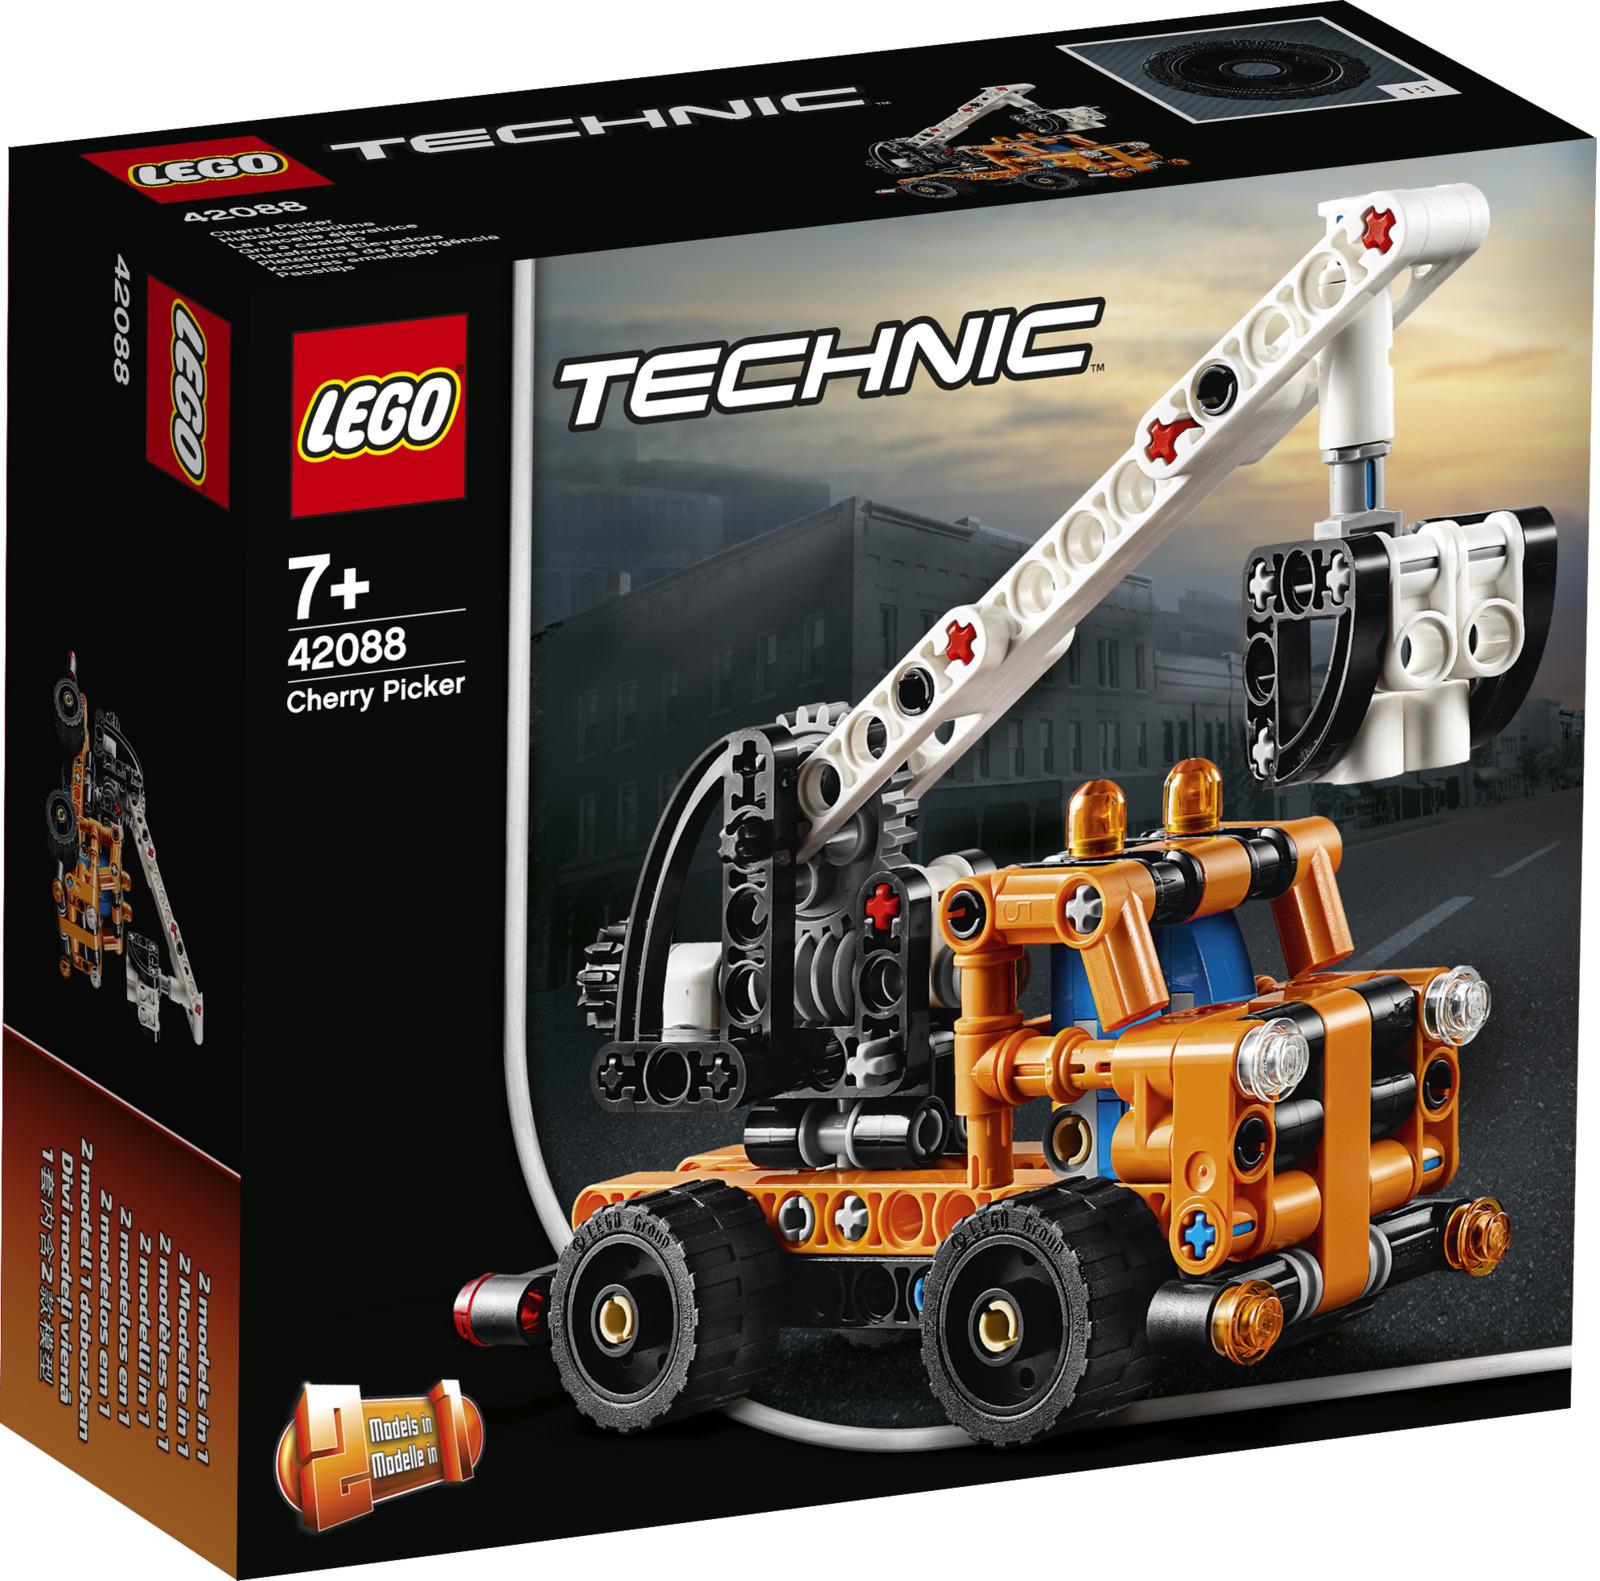 LEGO Technic 42088 Ремонтный автокран Конструктор цена